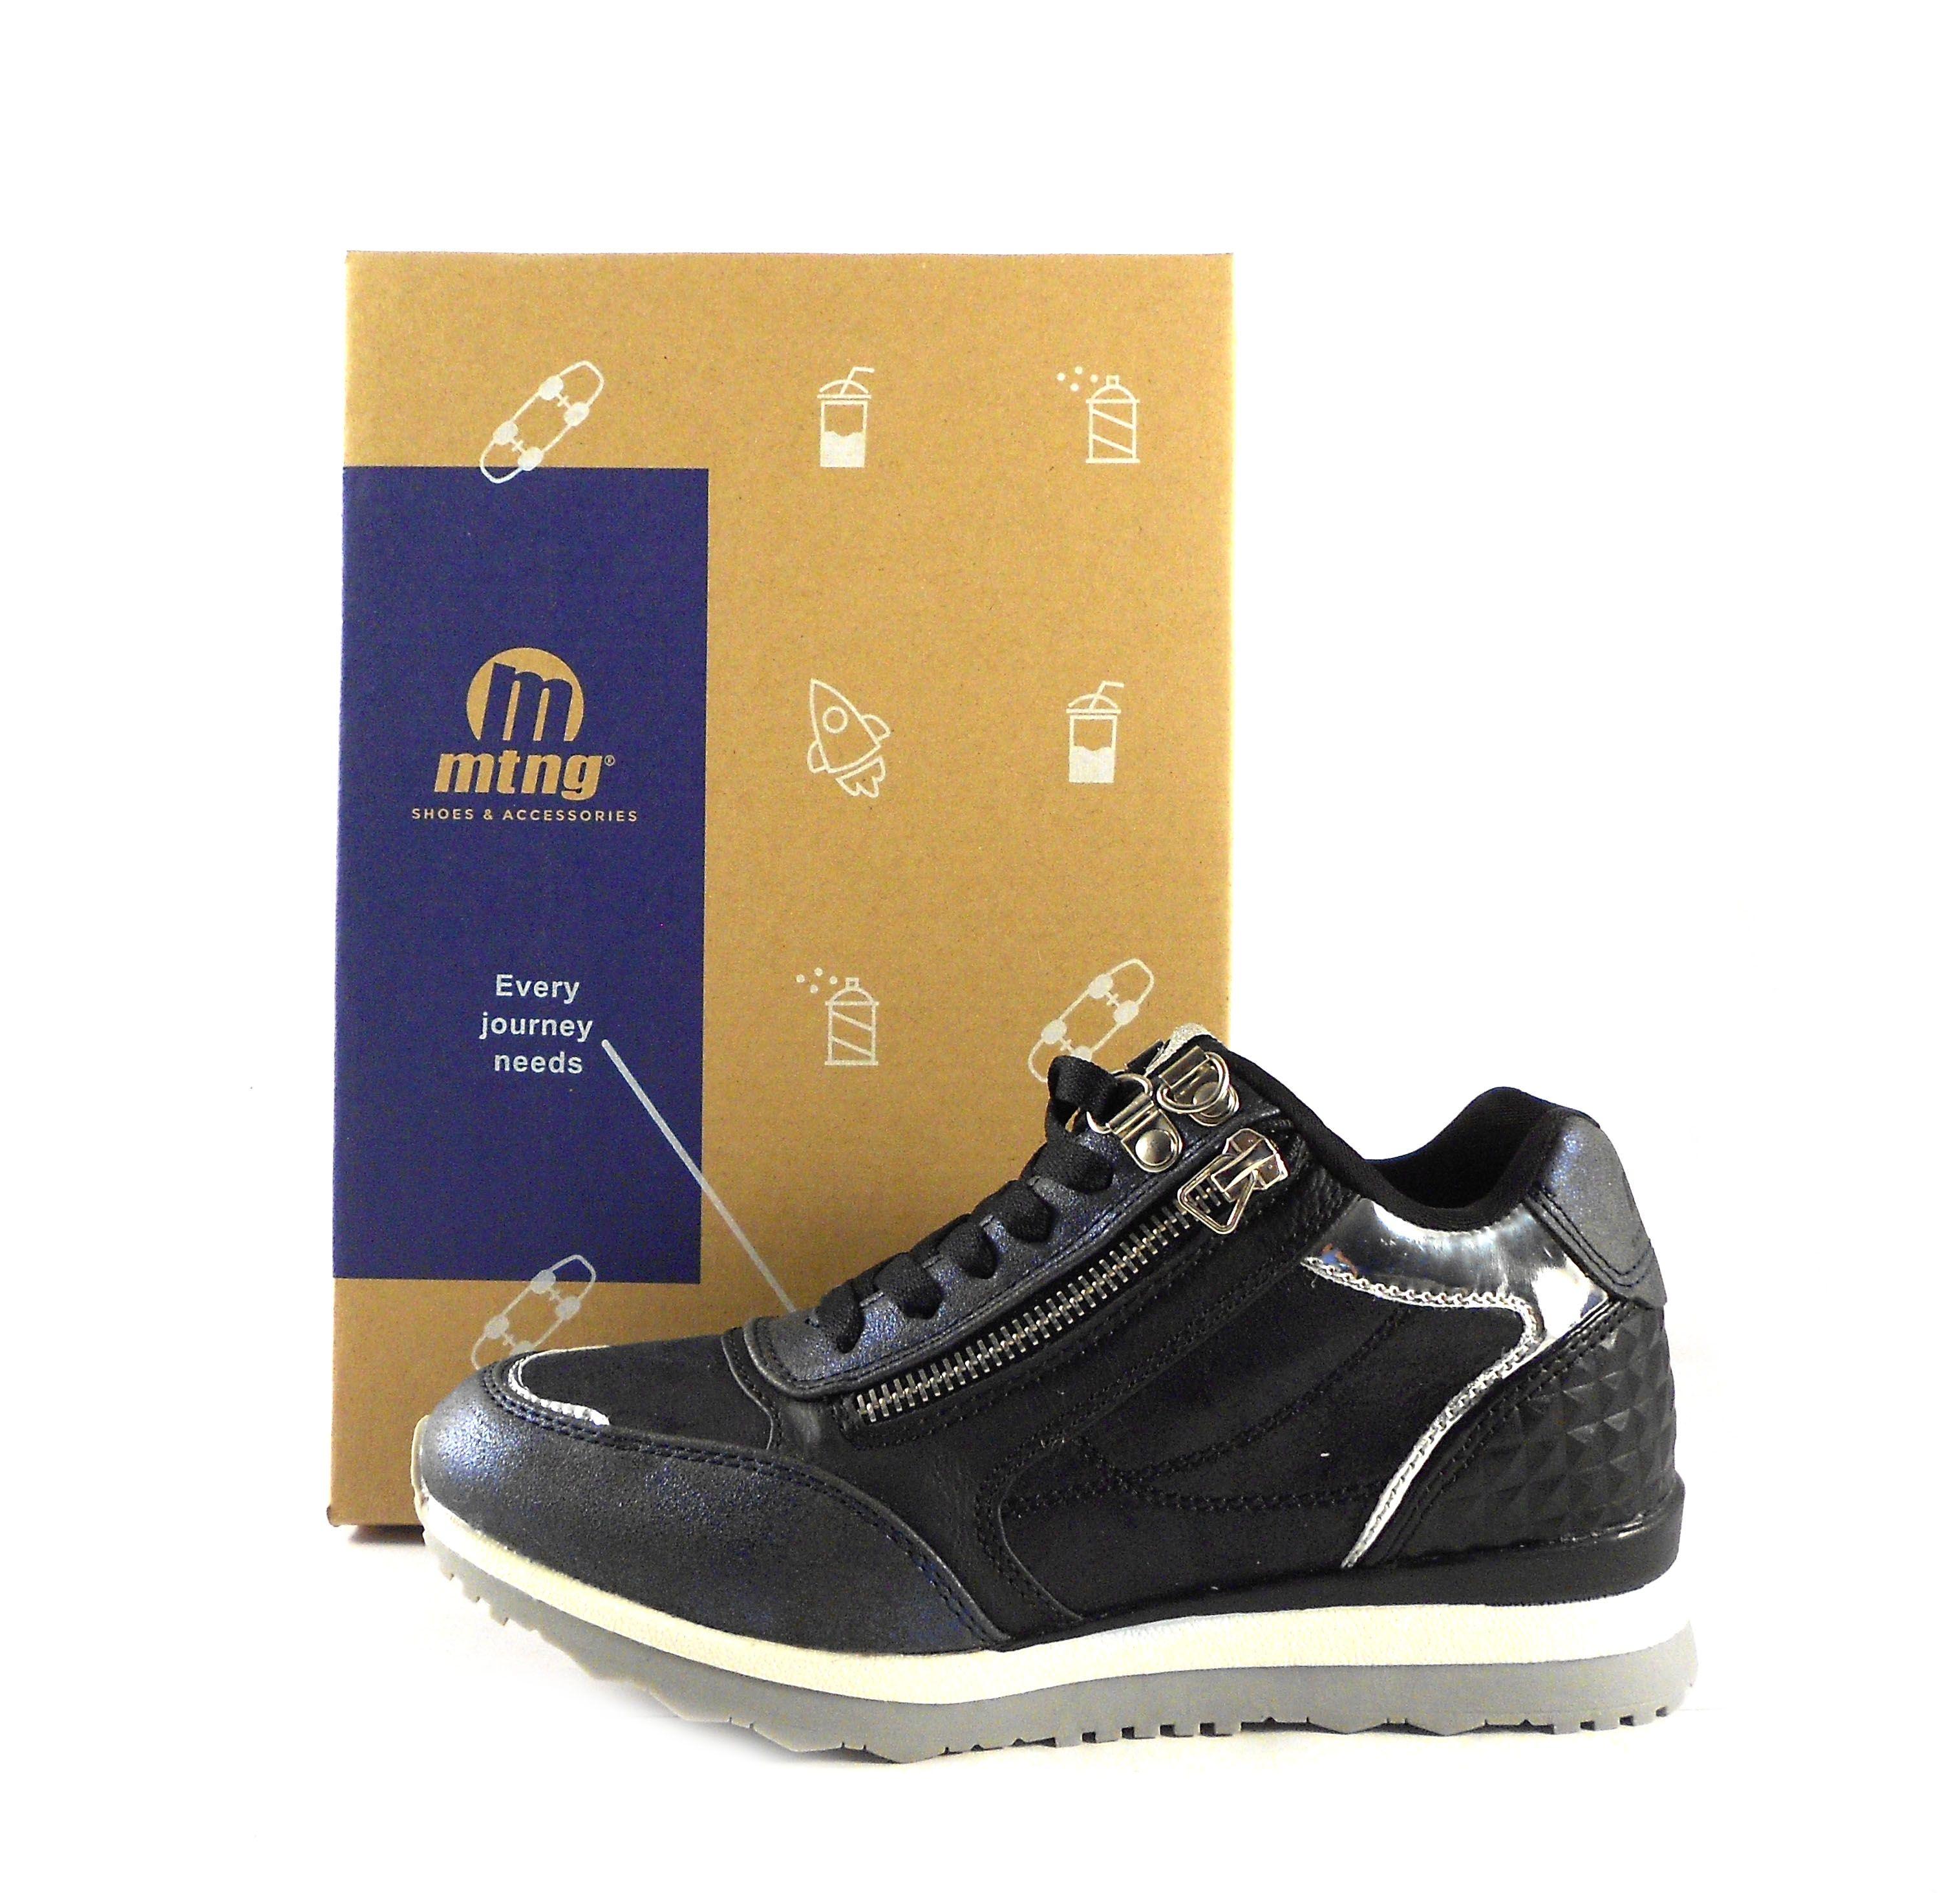 CALZADO - Sneakers & Deportivas Keys EyCDl2ZlRT